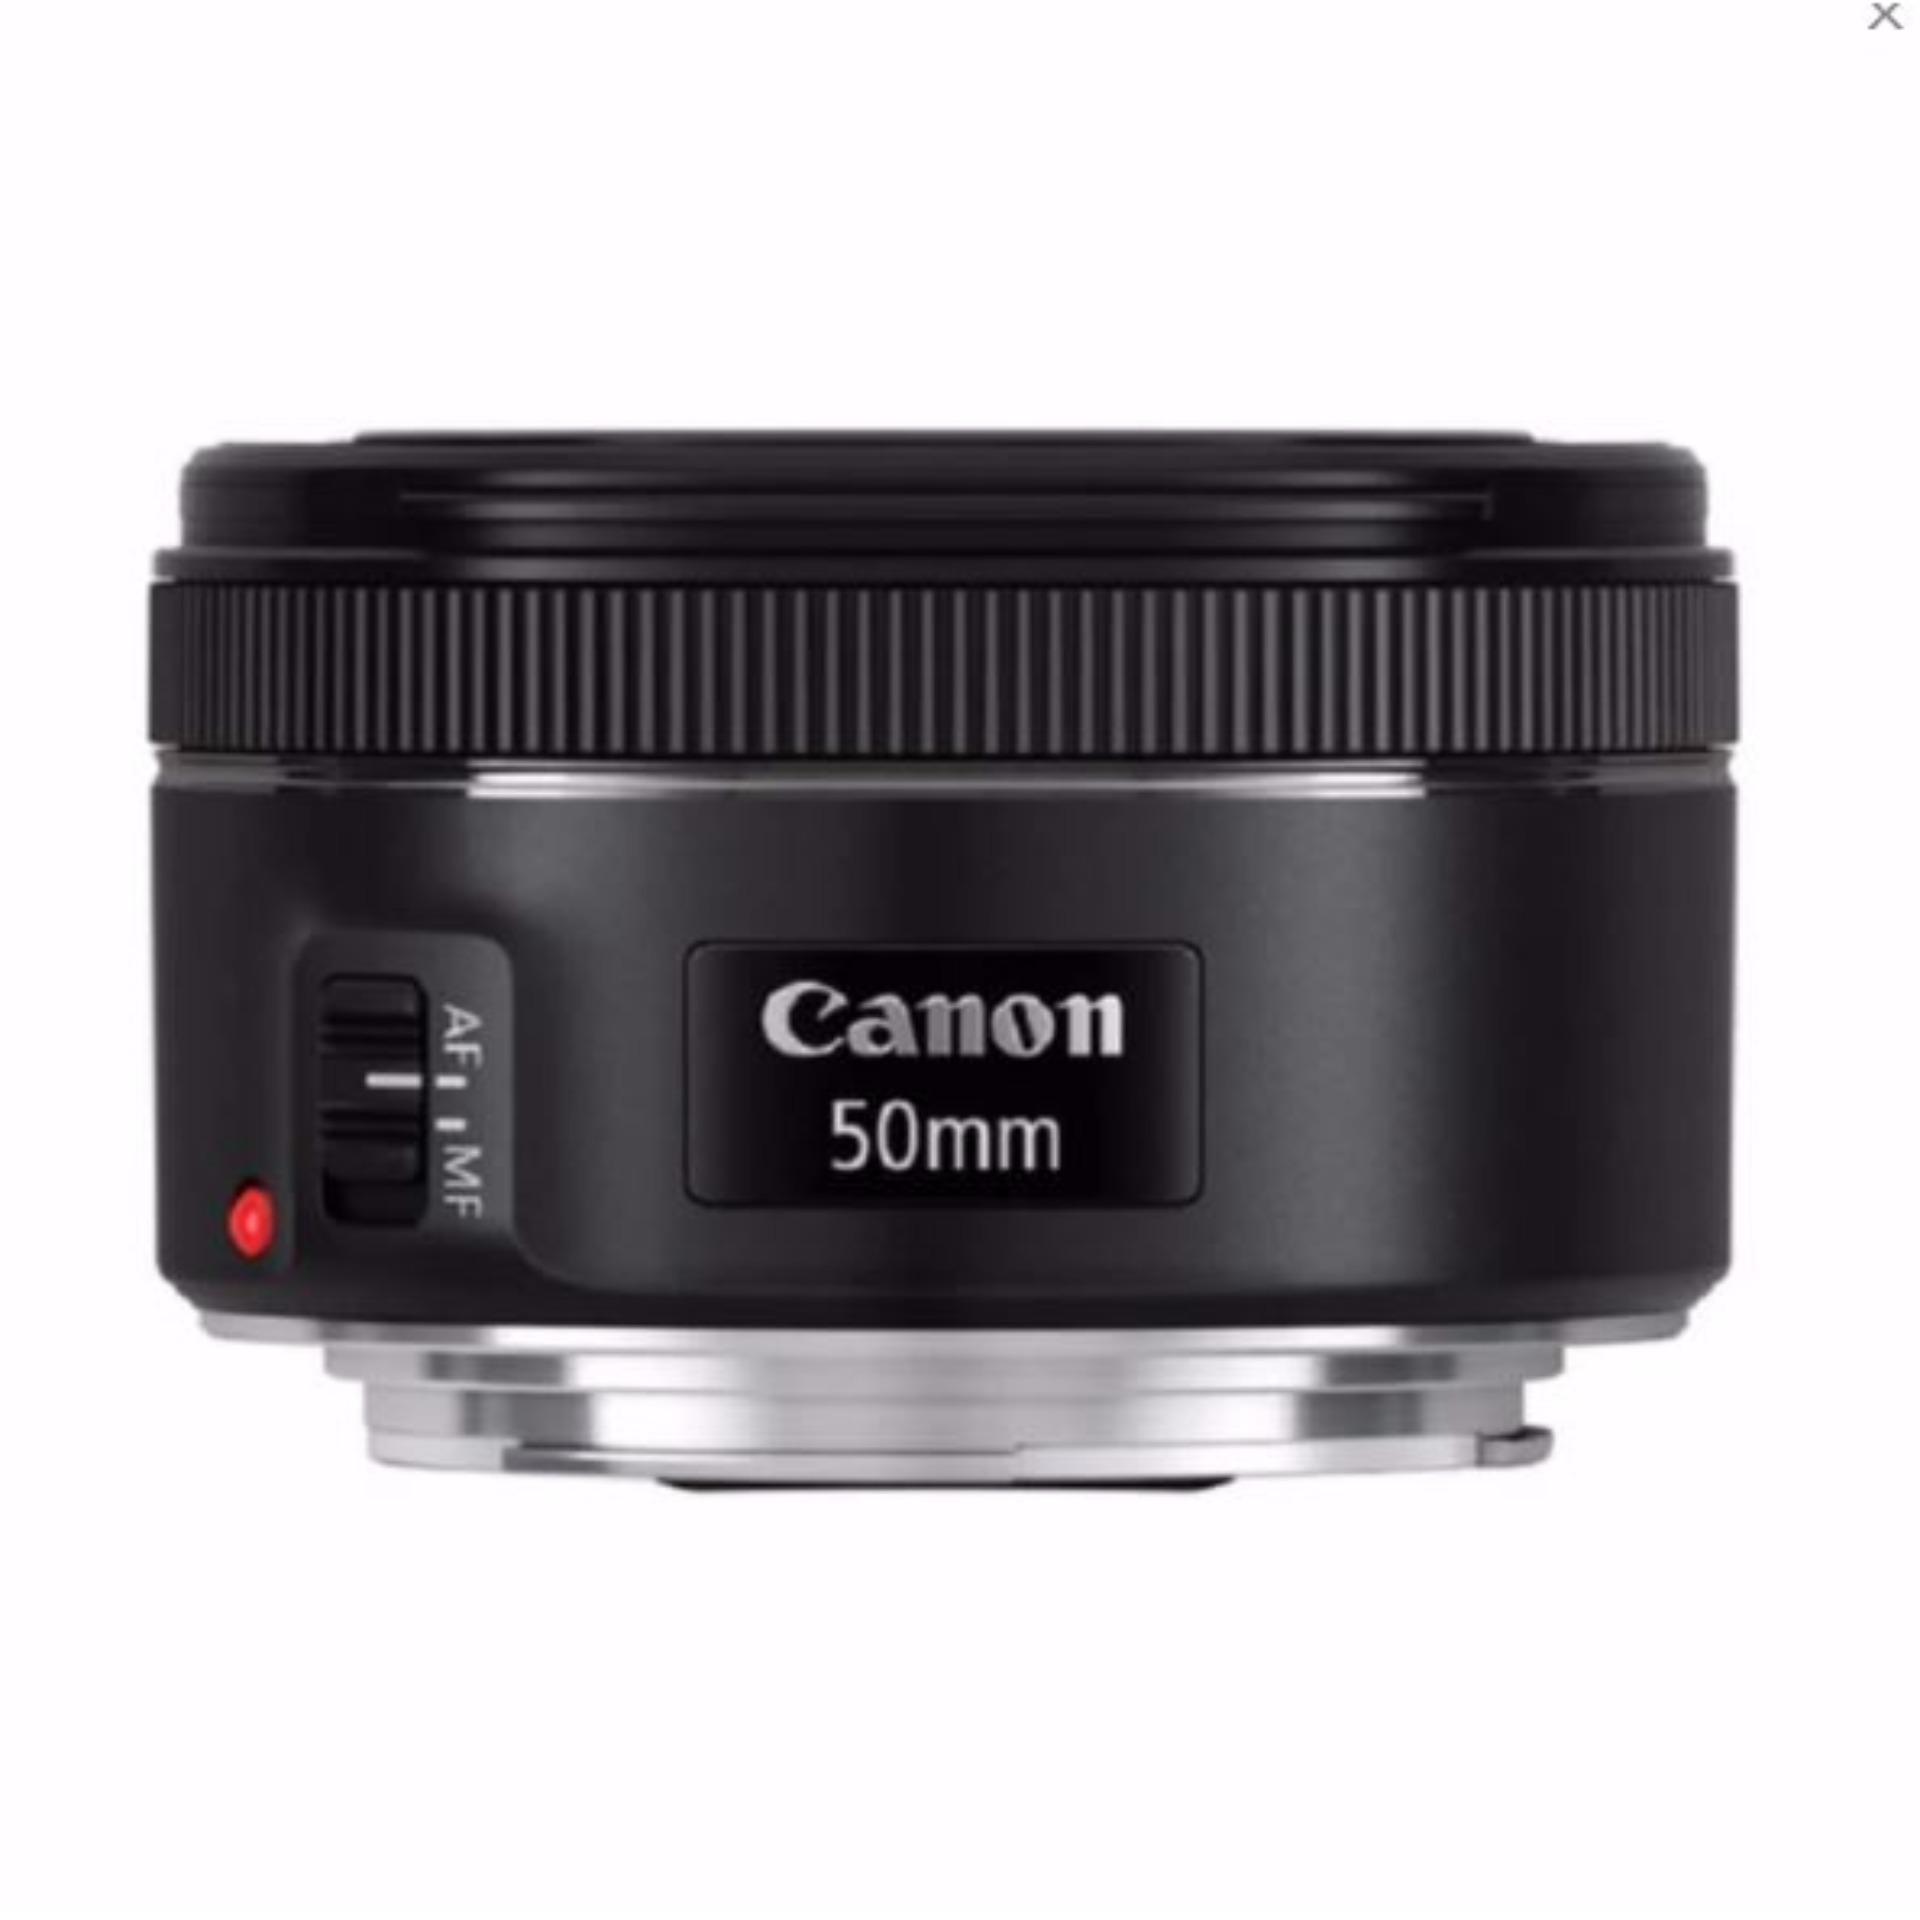 Canon EF 50mm f/1.8 STM Lens - Hitam (garansi resmi) ...